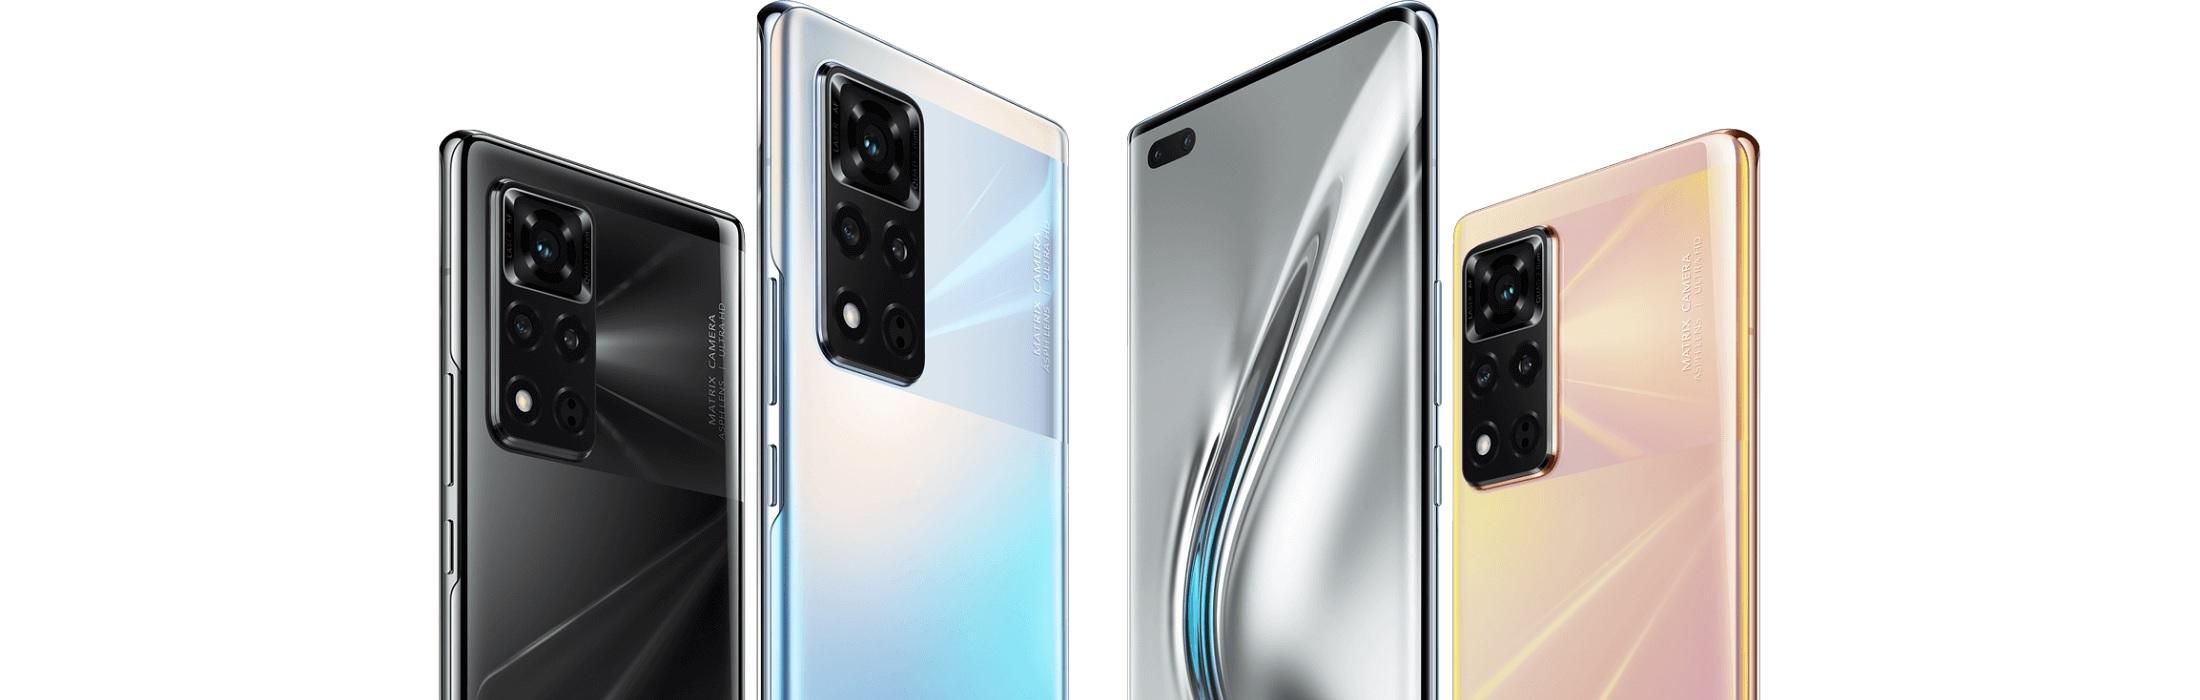 smartfon Honor V40 5G smartphone